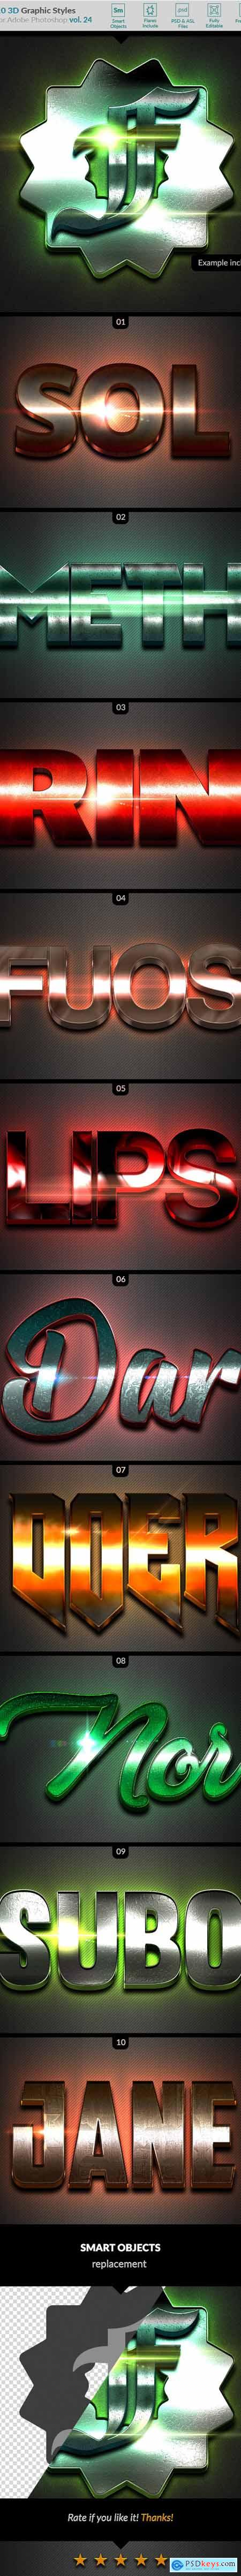 10 3D Styles vol. 24 24141603